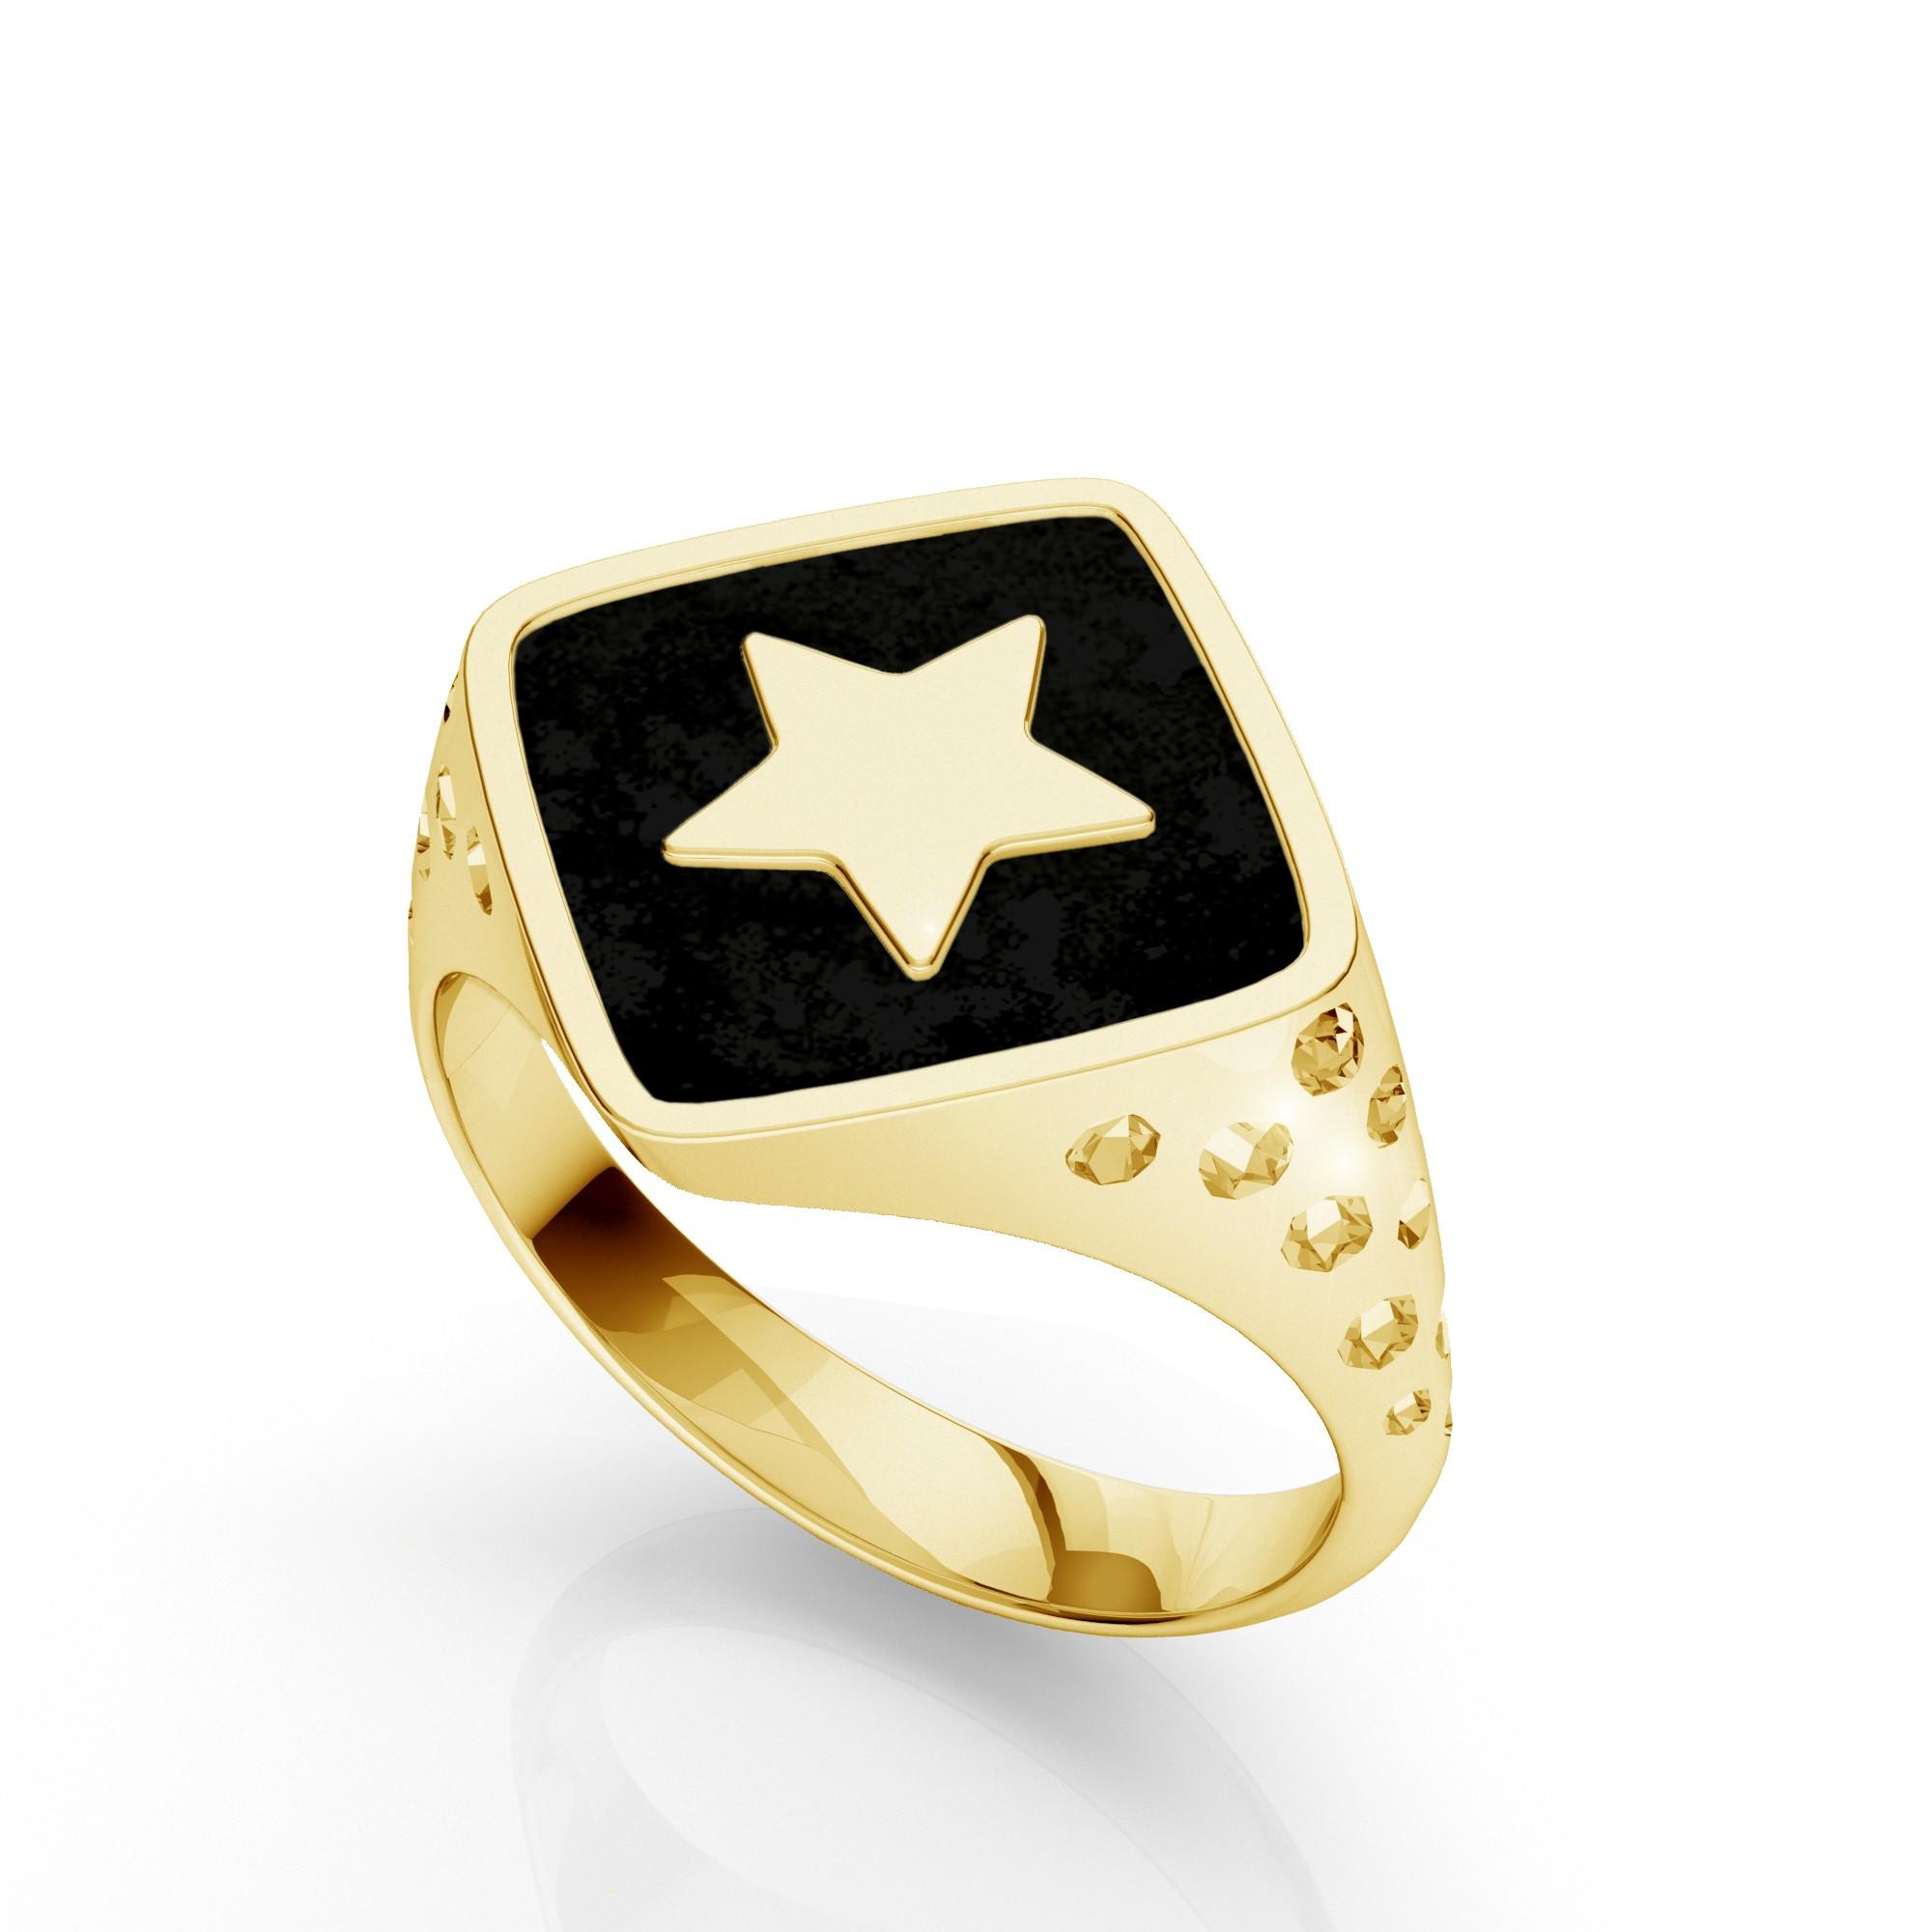 Srebrny sygnet gwiazda, MON DÉFI, srebro 925